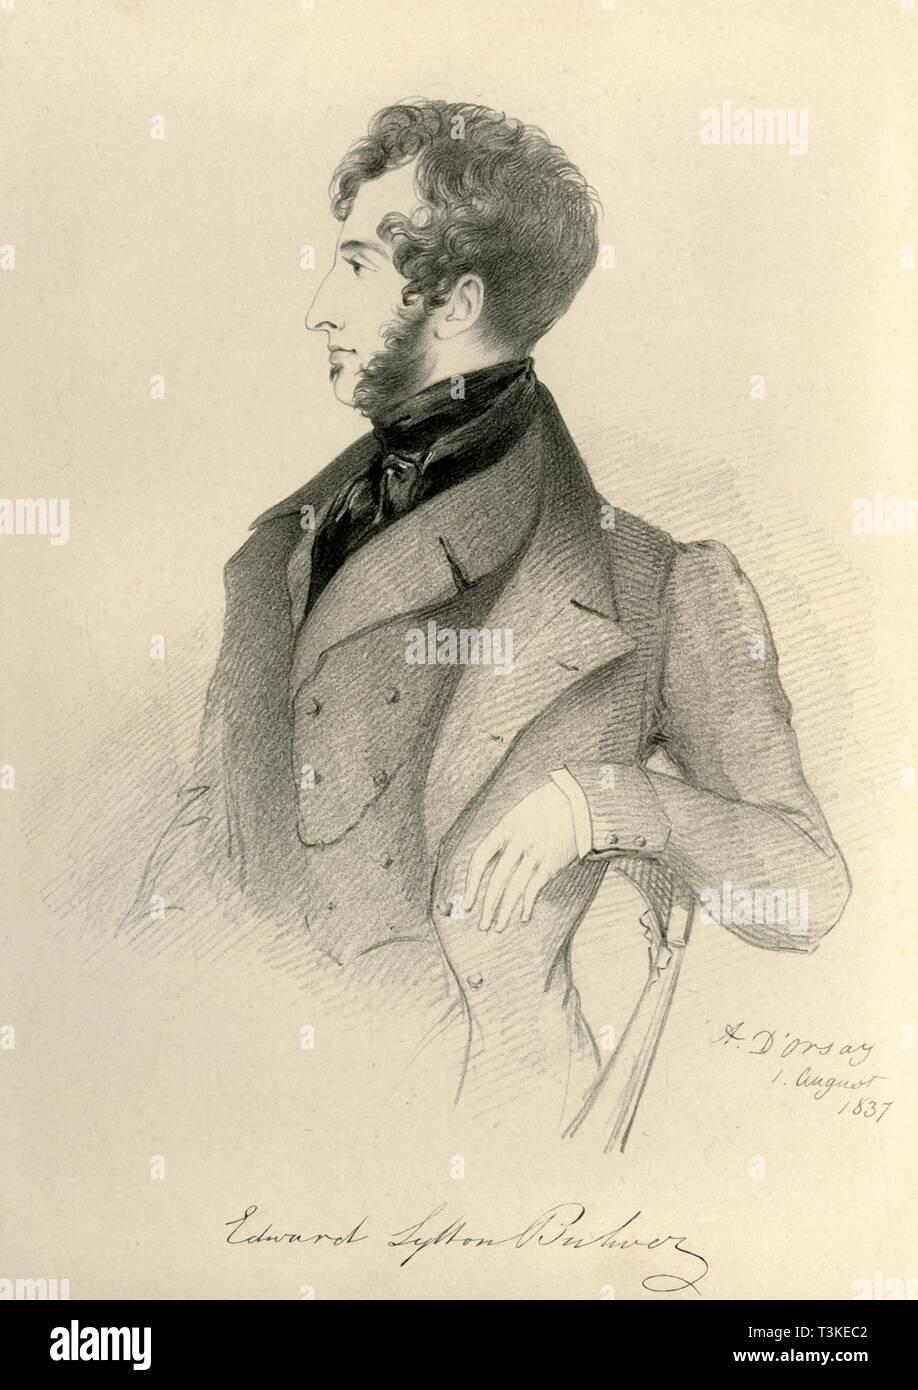 'Edward Lytton Bulwer', 1837. Creator: Richard James Lane. - Stock Image